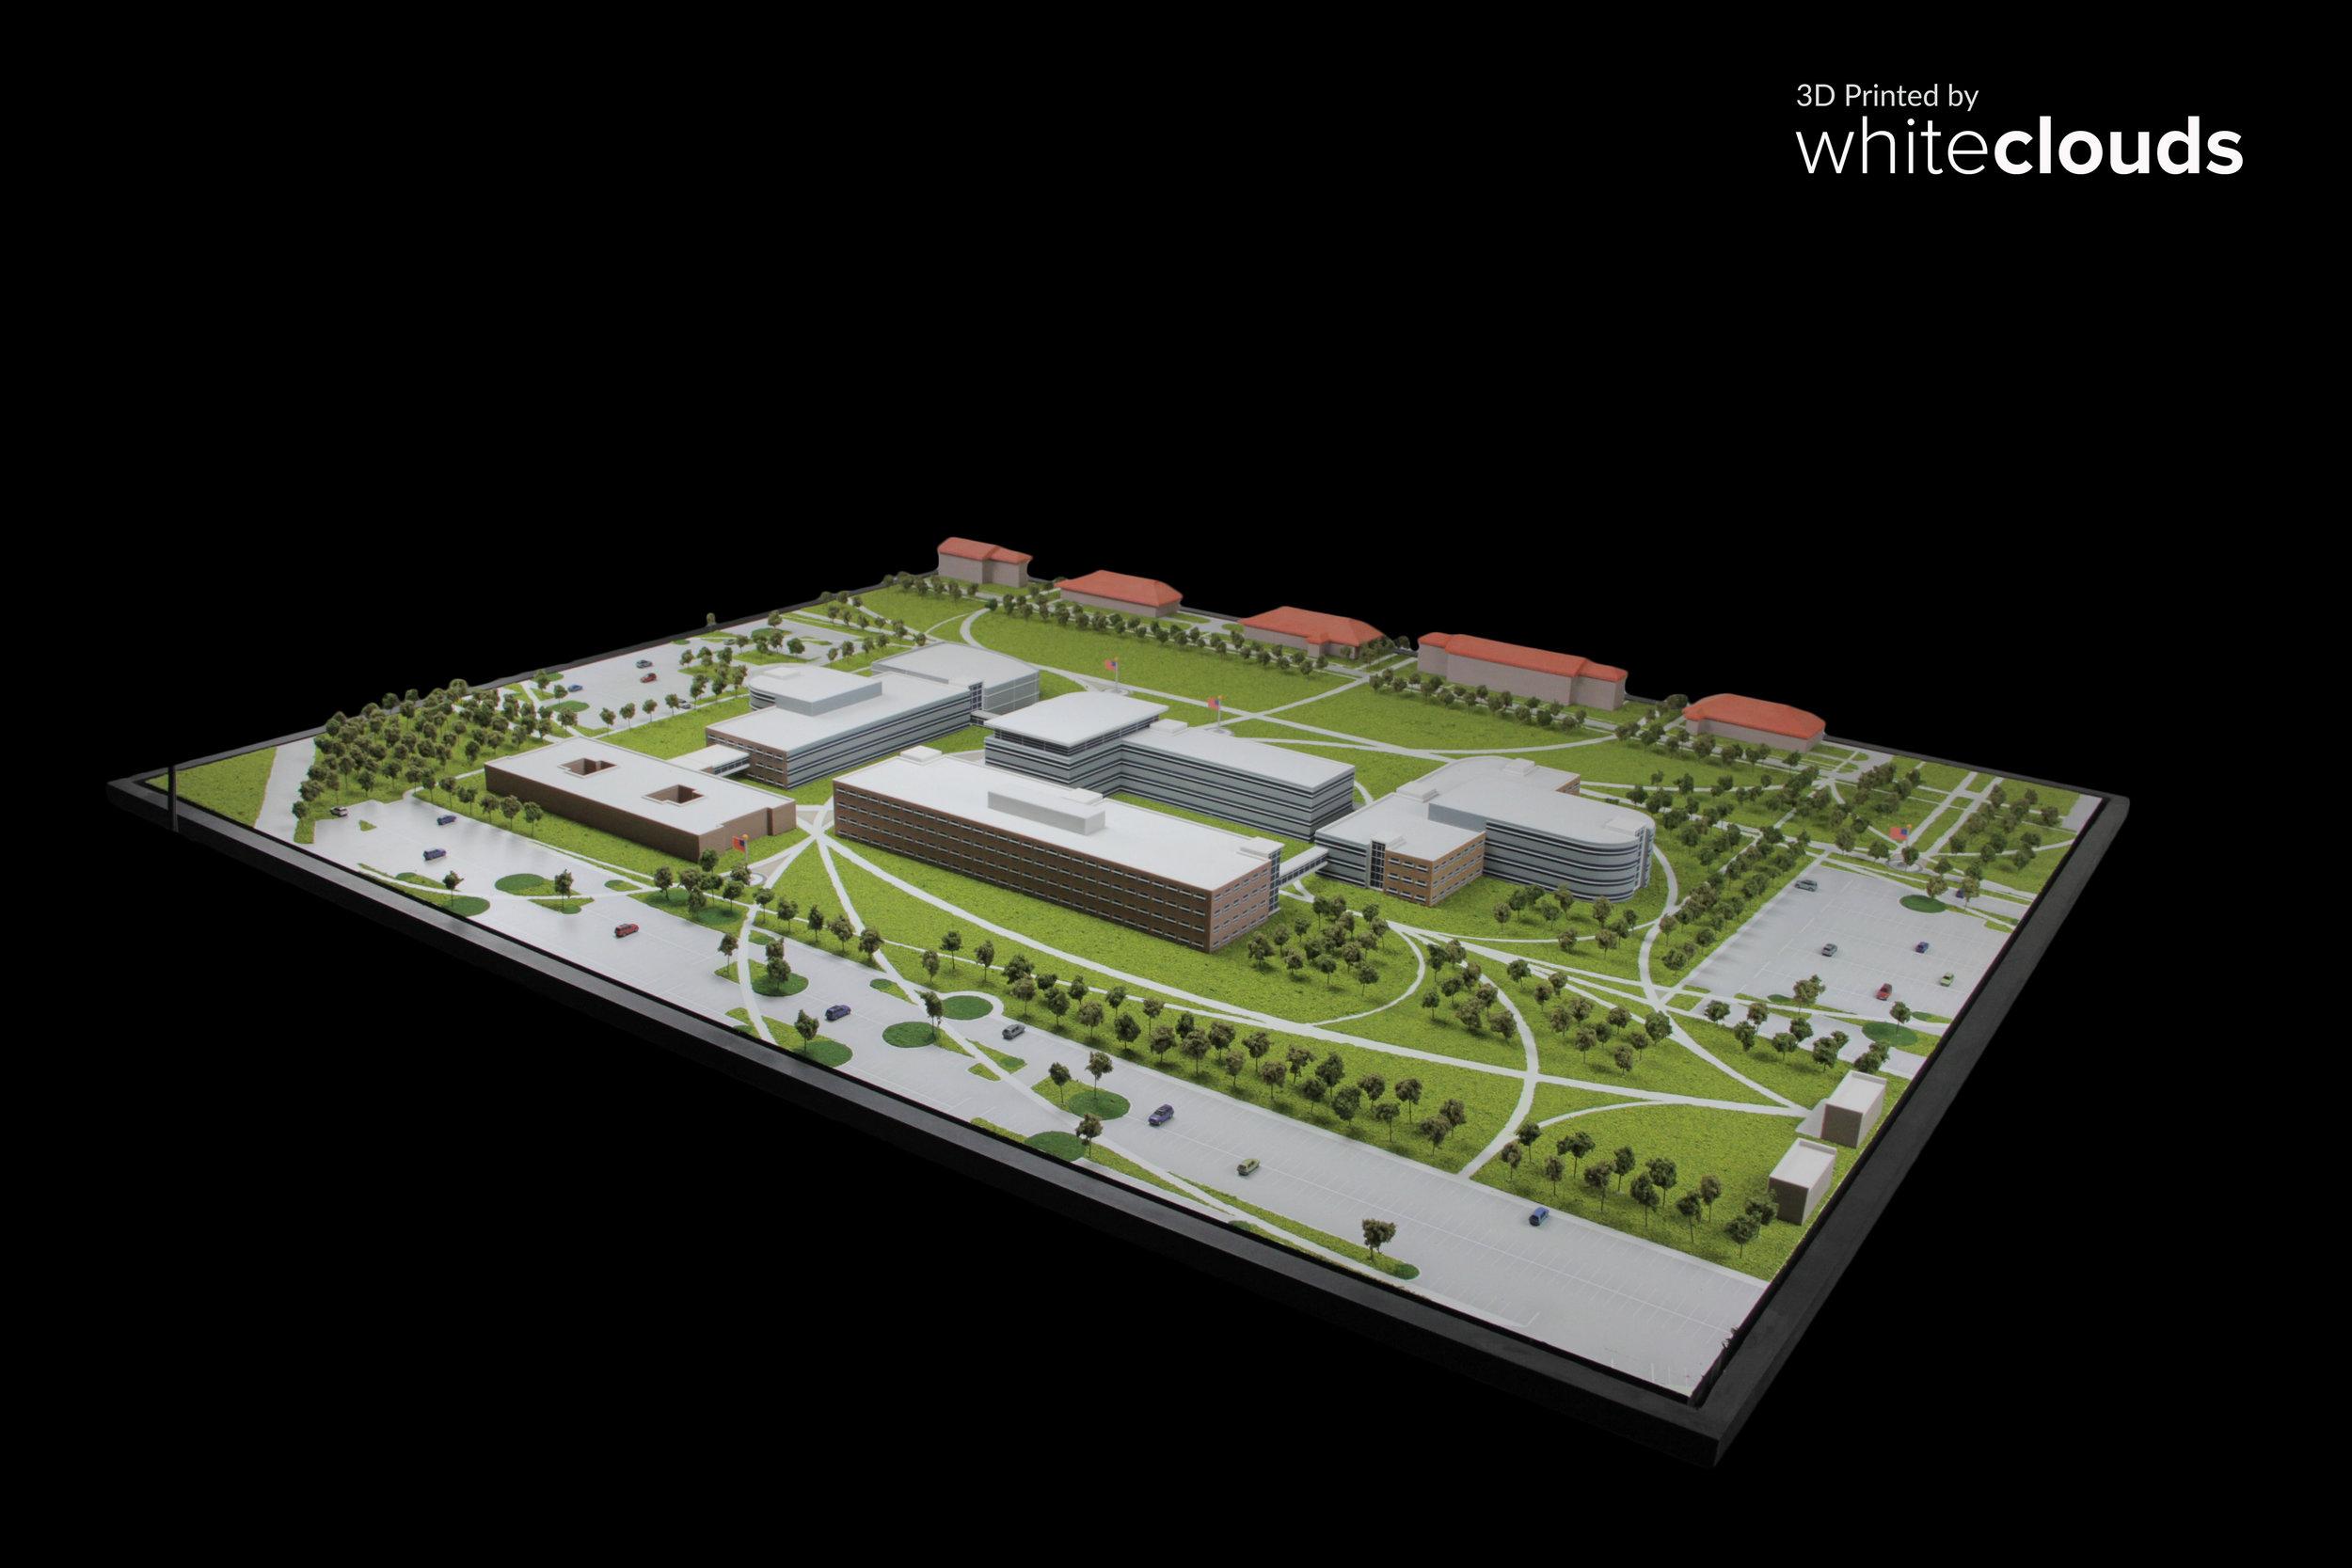 3D-Printed-WhiteClouds-Fort-Gordon-Architecture-Fort-Gordon-Website-1.JPG